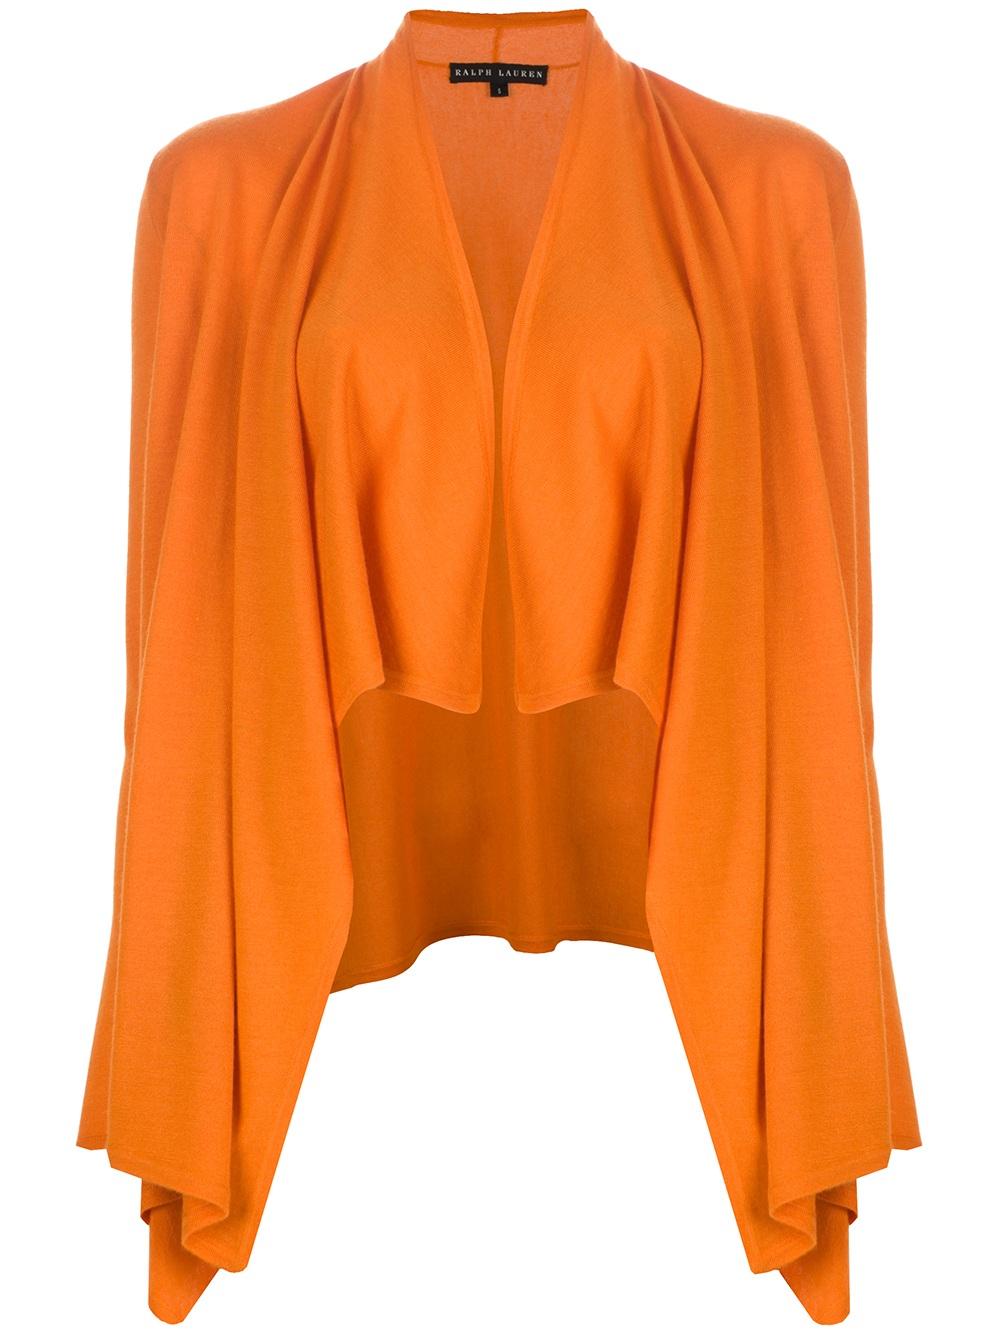 Ralph lauren black label Waterfall Cardigan in Orange | Lyst